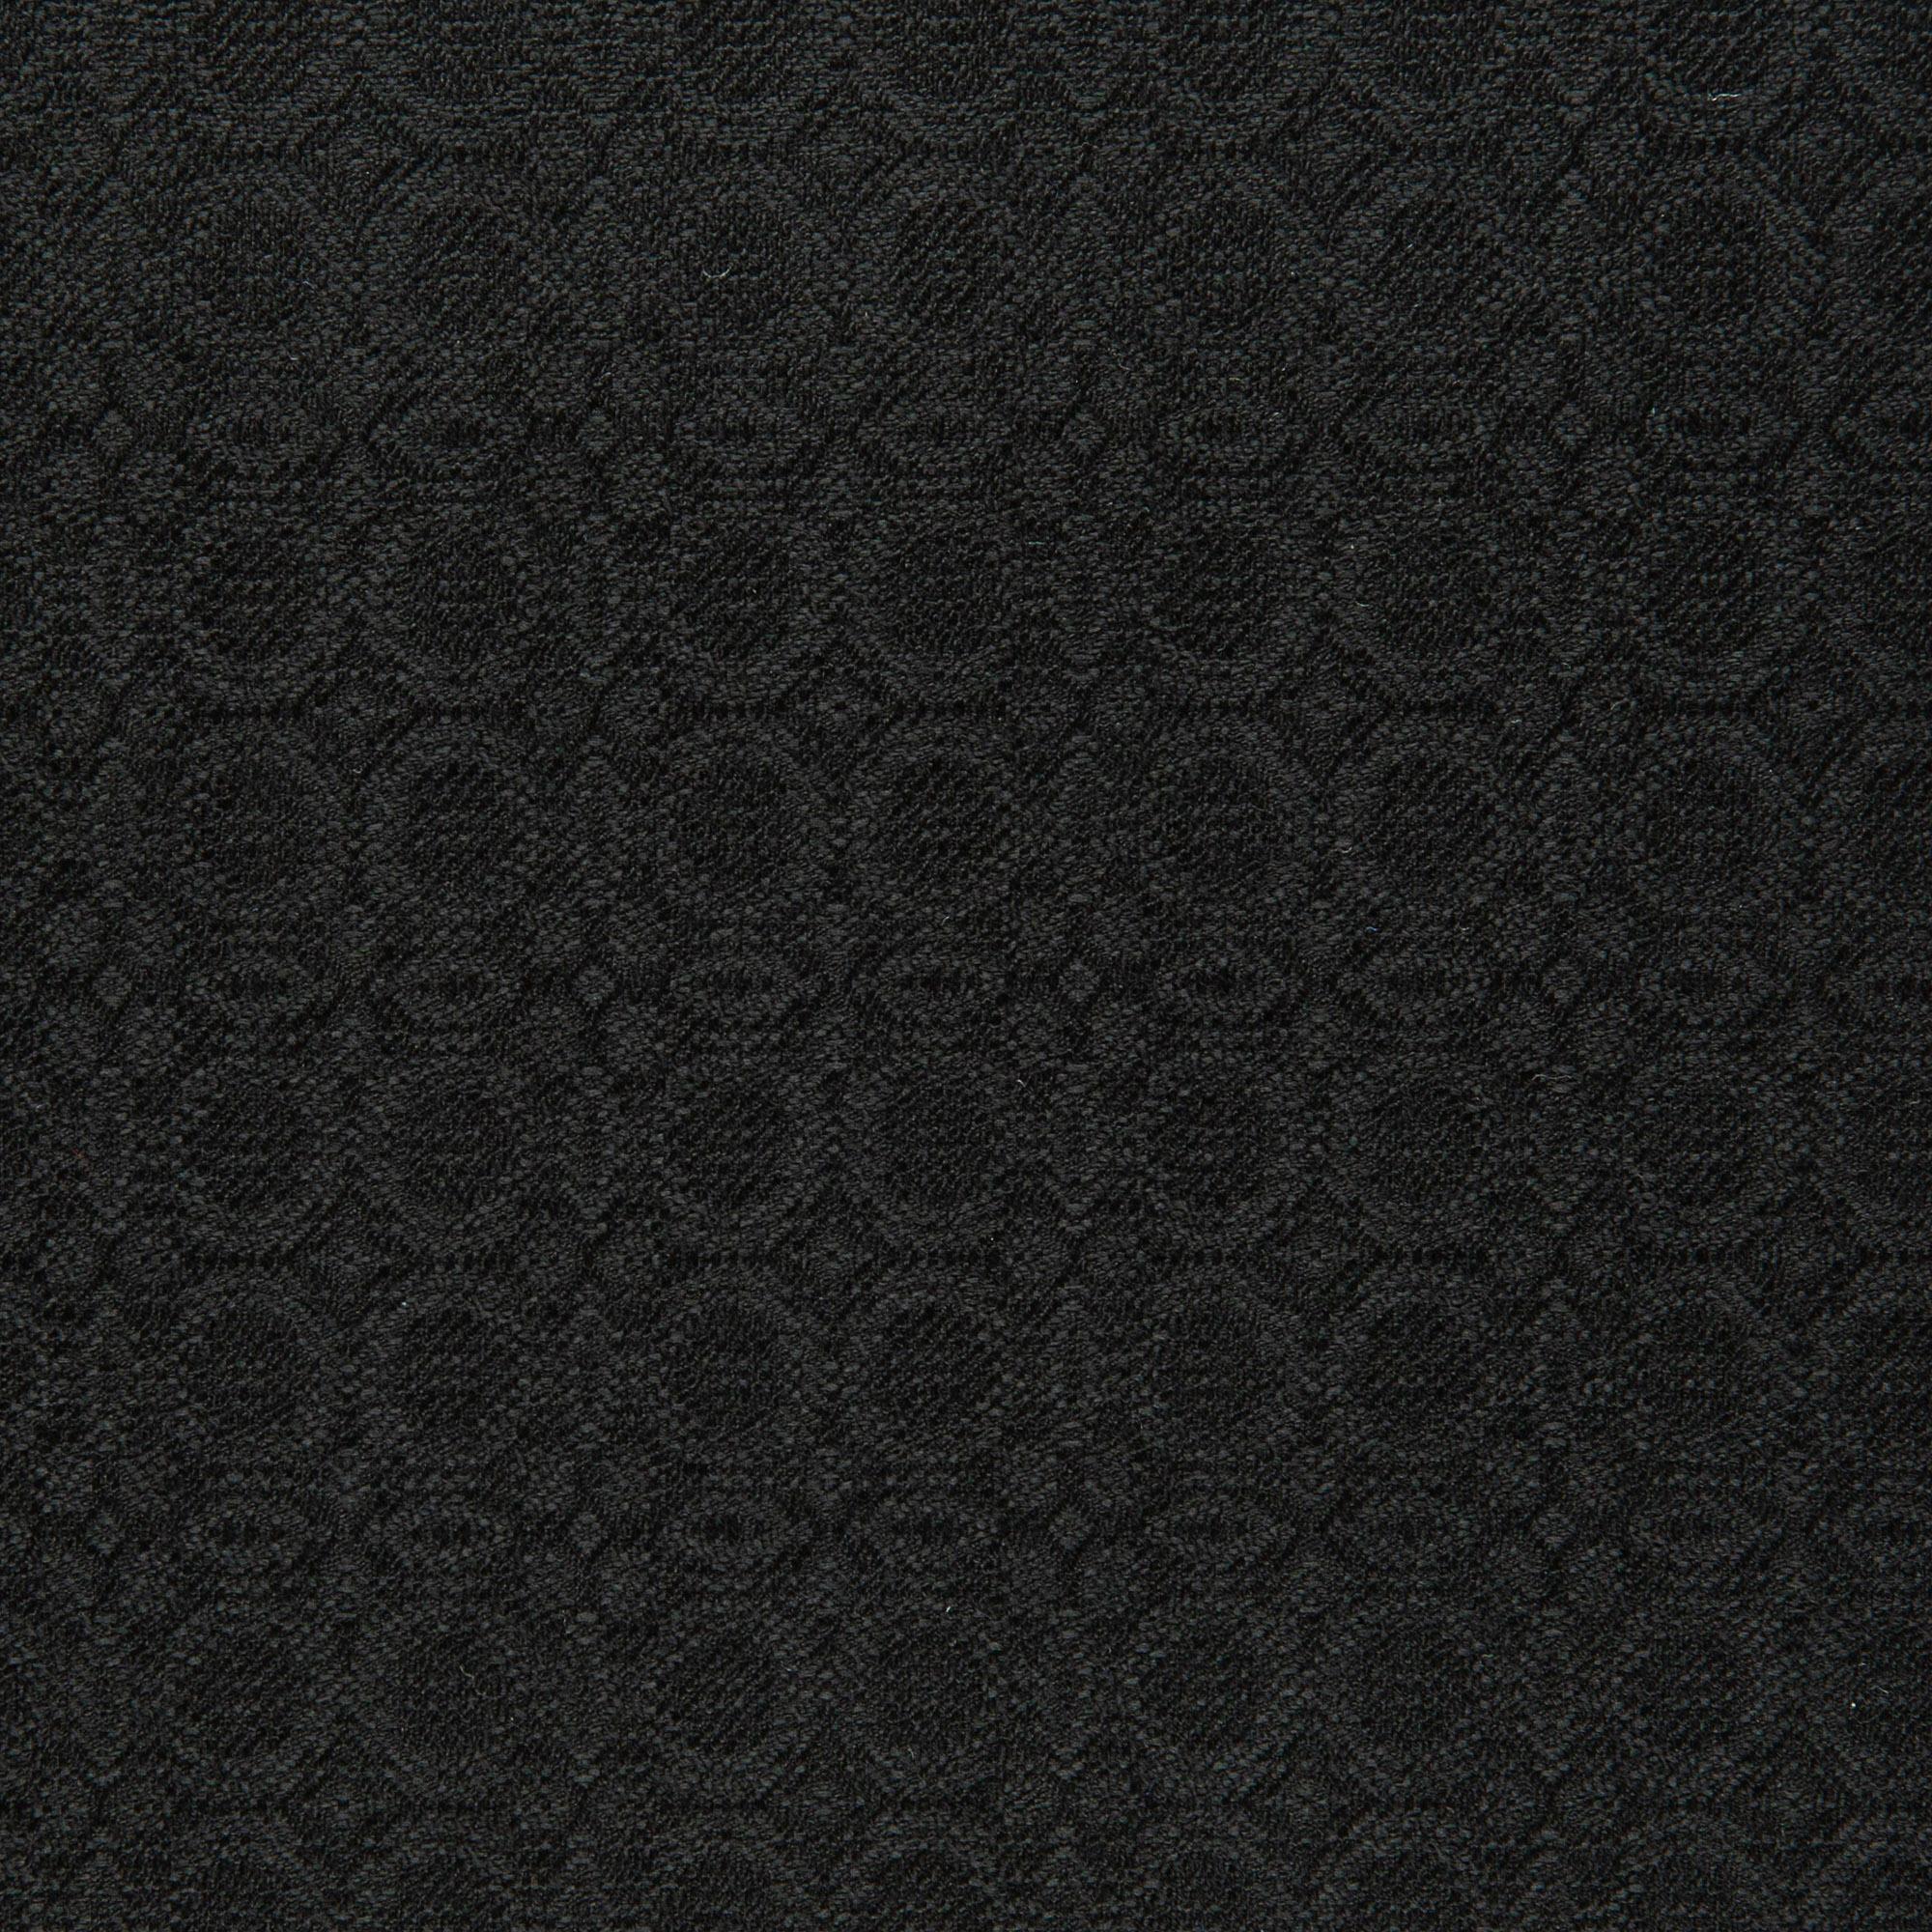 Sz055003 1